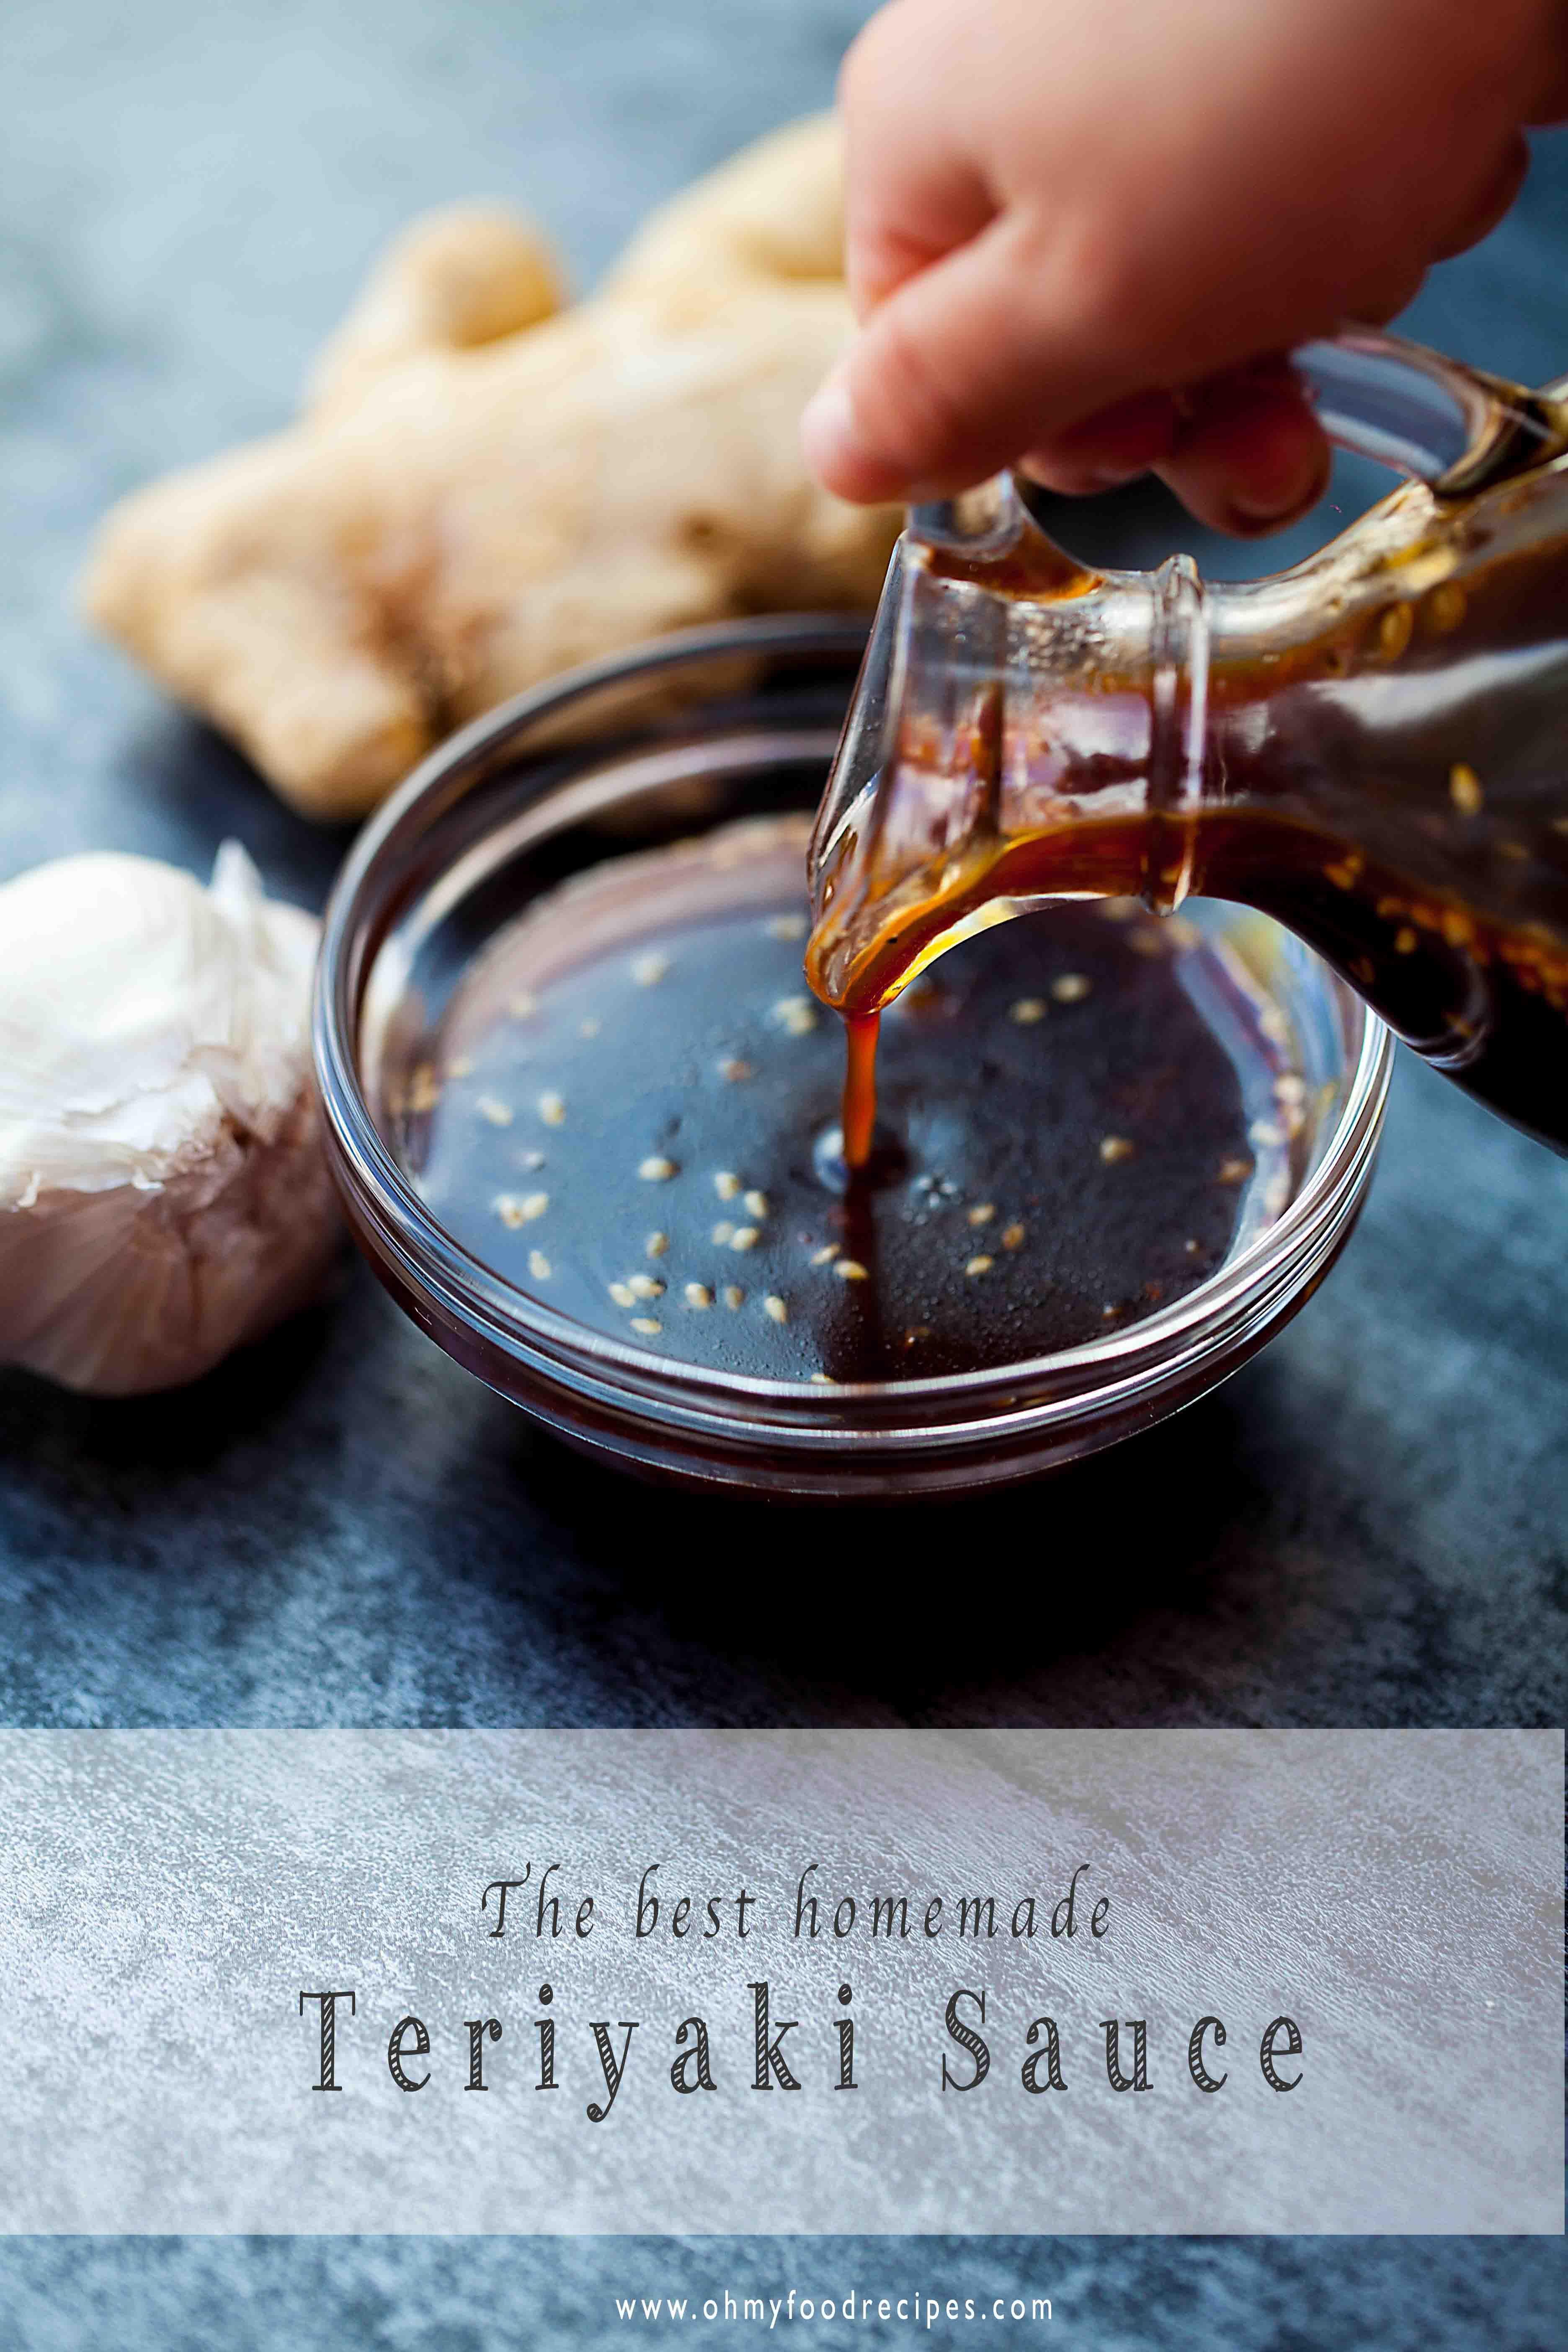 Homemade Teriyaki Sauce 照り焼き Oh My Food Recipes Recipe Teriyaki Sauce Recipe Homemade Teriyaki Sauce Teriyaki Sauce